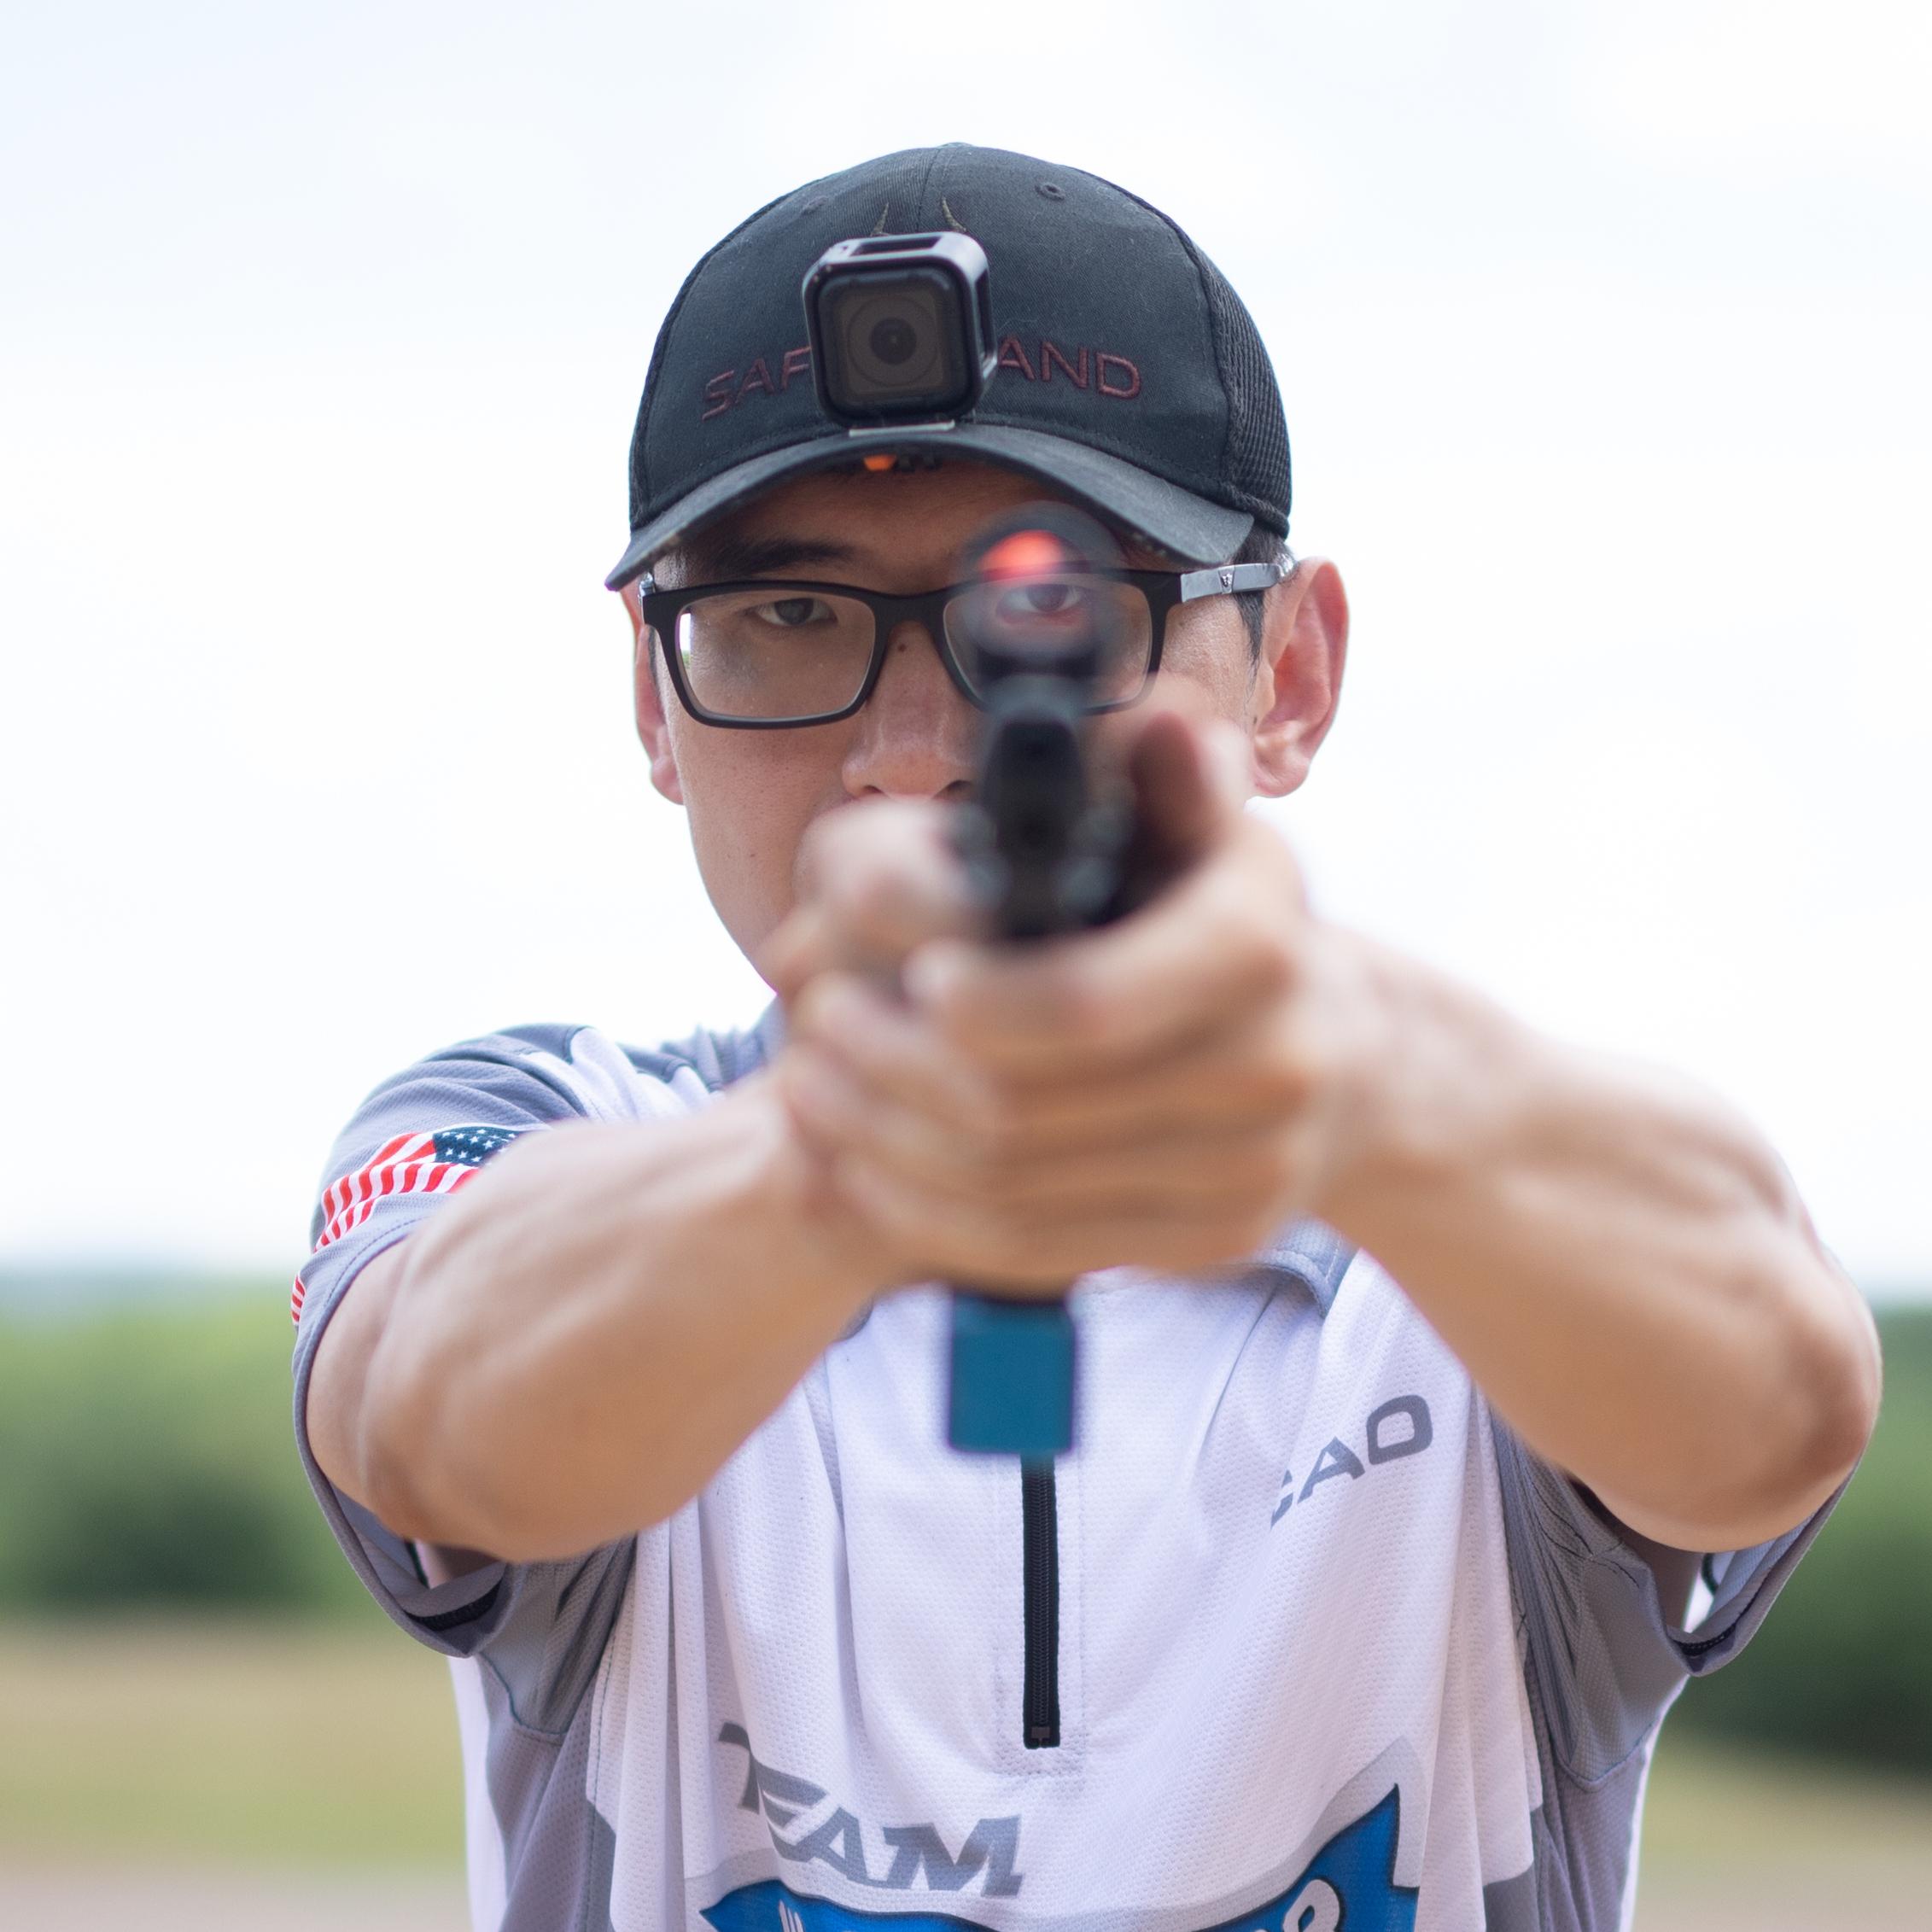 Walther Team Luke Cao